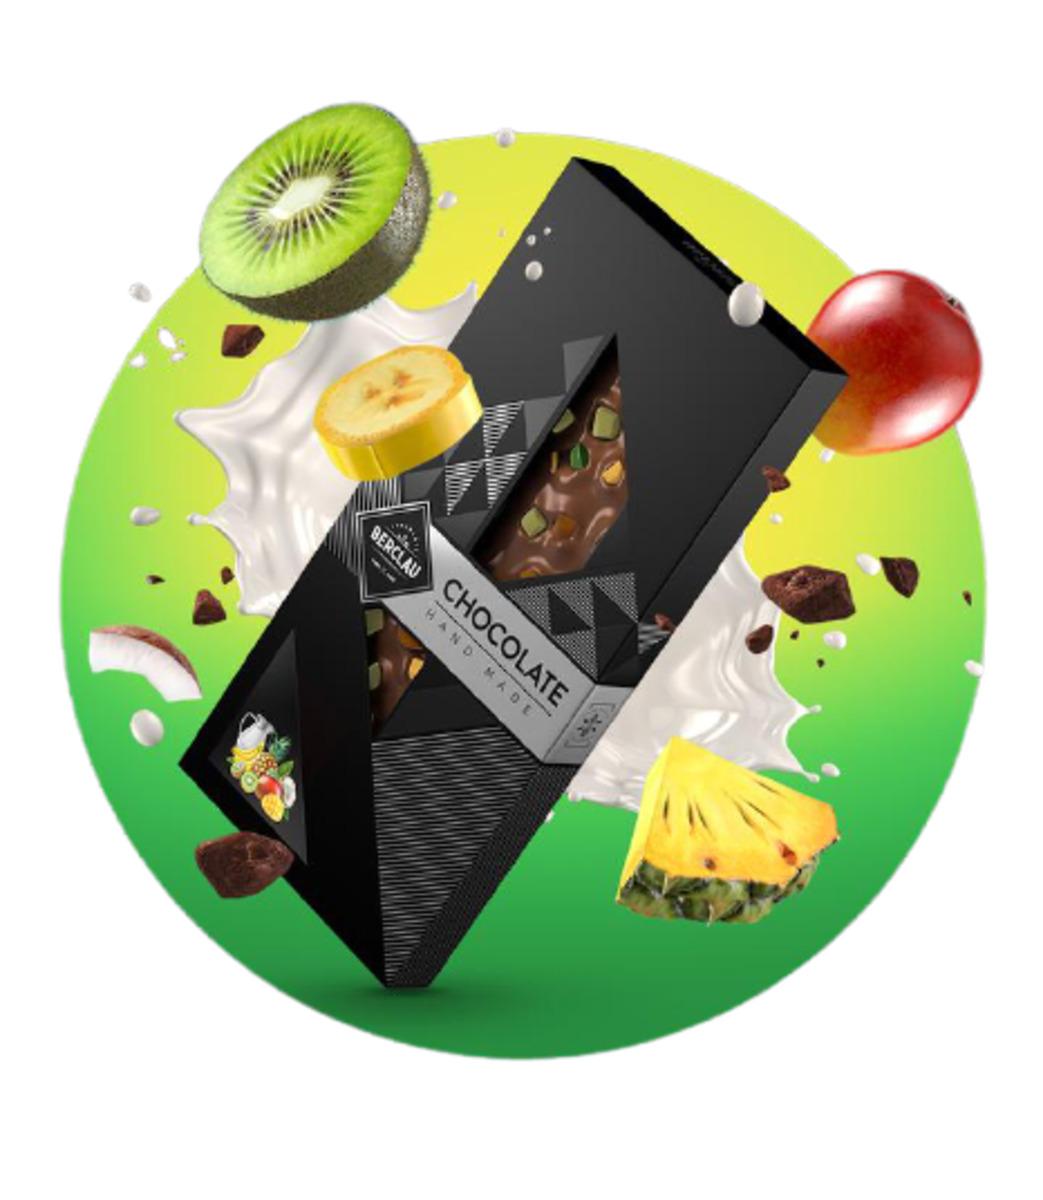 Chocolate con Leche Tropical Berclau